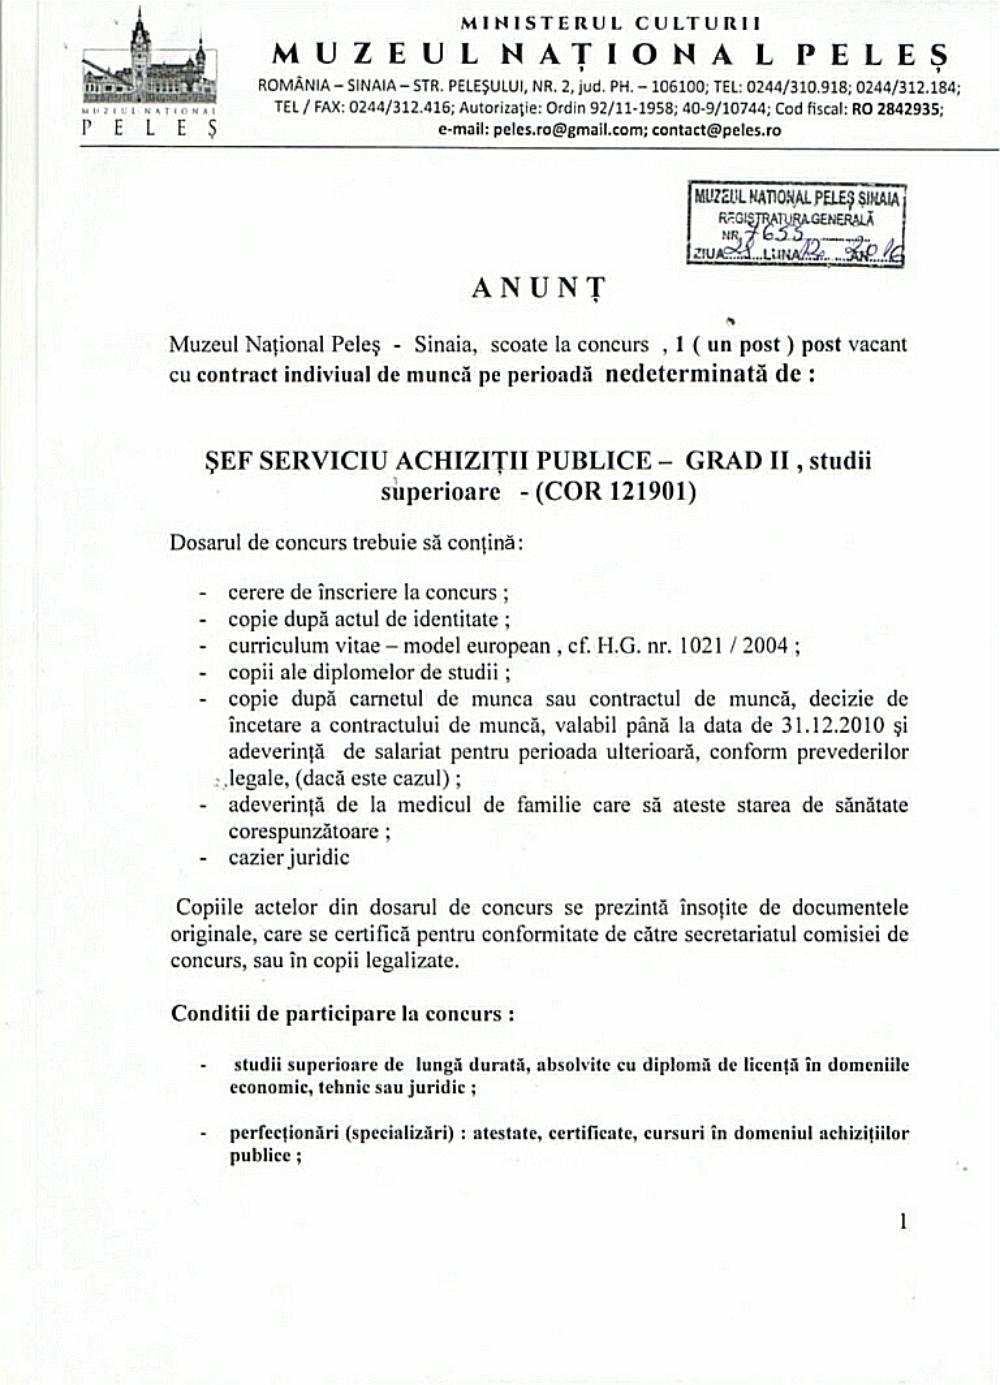 anunt-sef-serv-achiz-publ_-pag_-1-970x1344